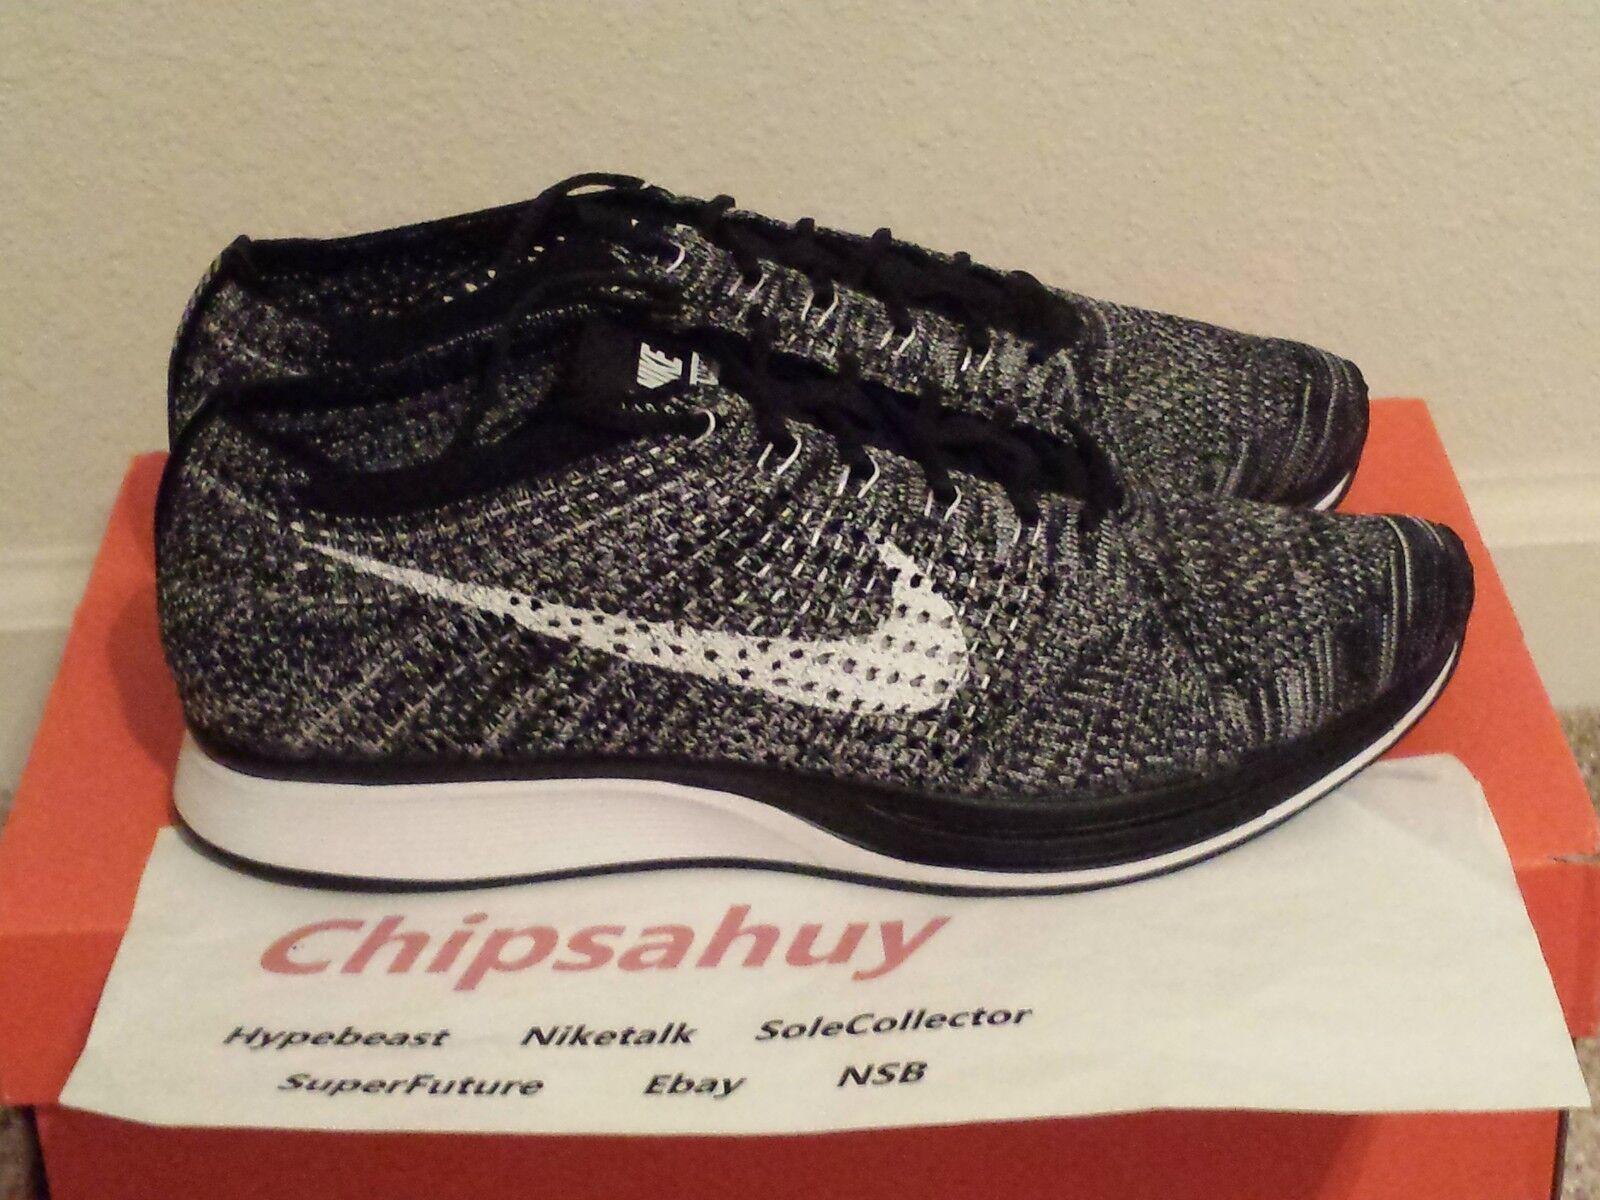 Nike Flyknit Racer Racer Racer Oreo 2.0 grigio bianca nero Zoom Air Trainer scarpe DS Dimensione 10 78b706